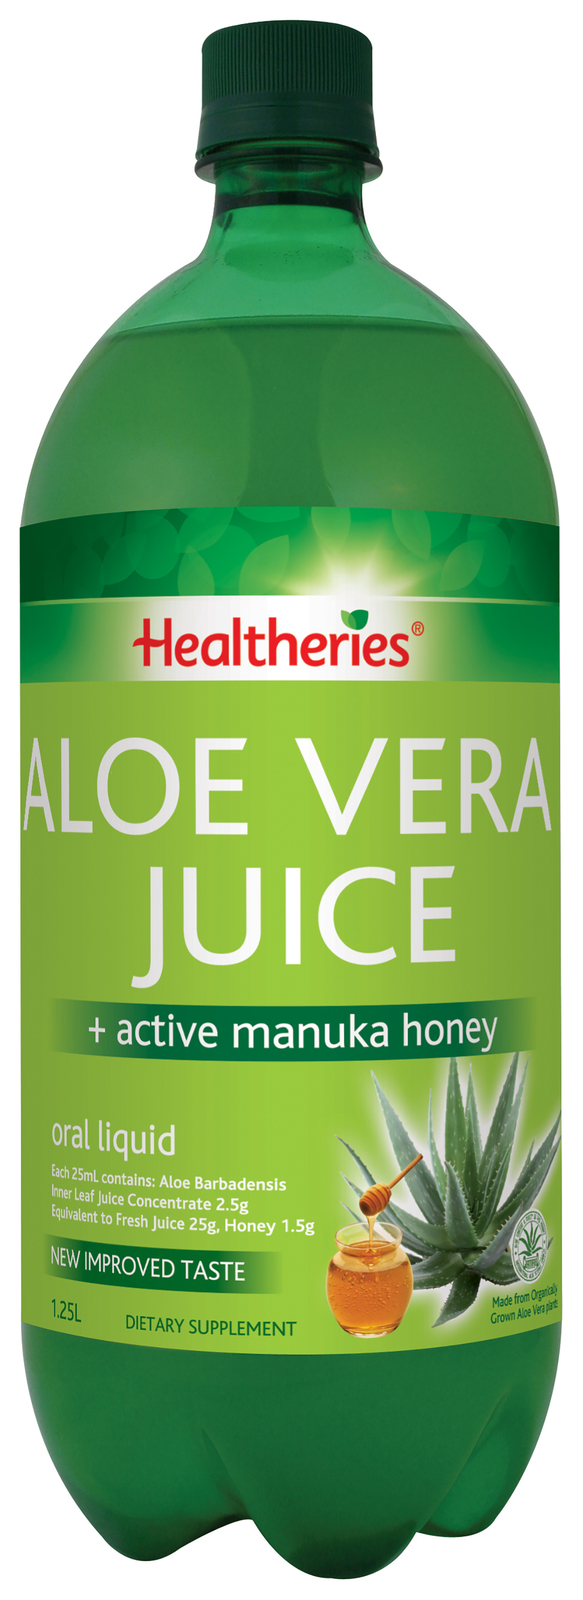 Healtherires Aloe Vera Juice (1.25ltr) image